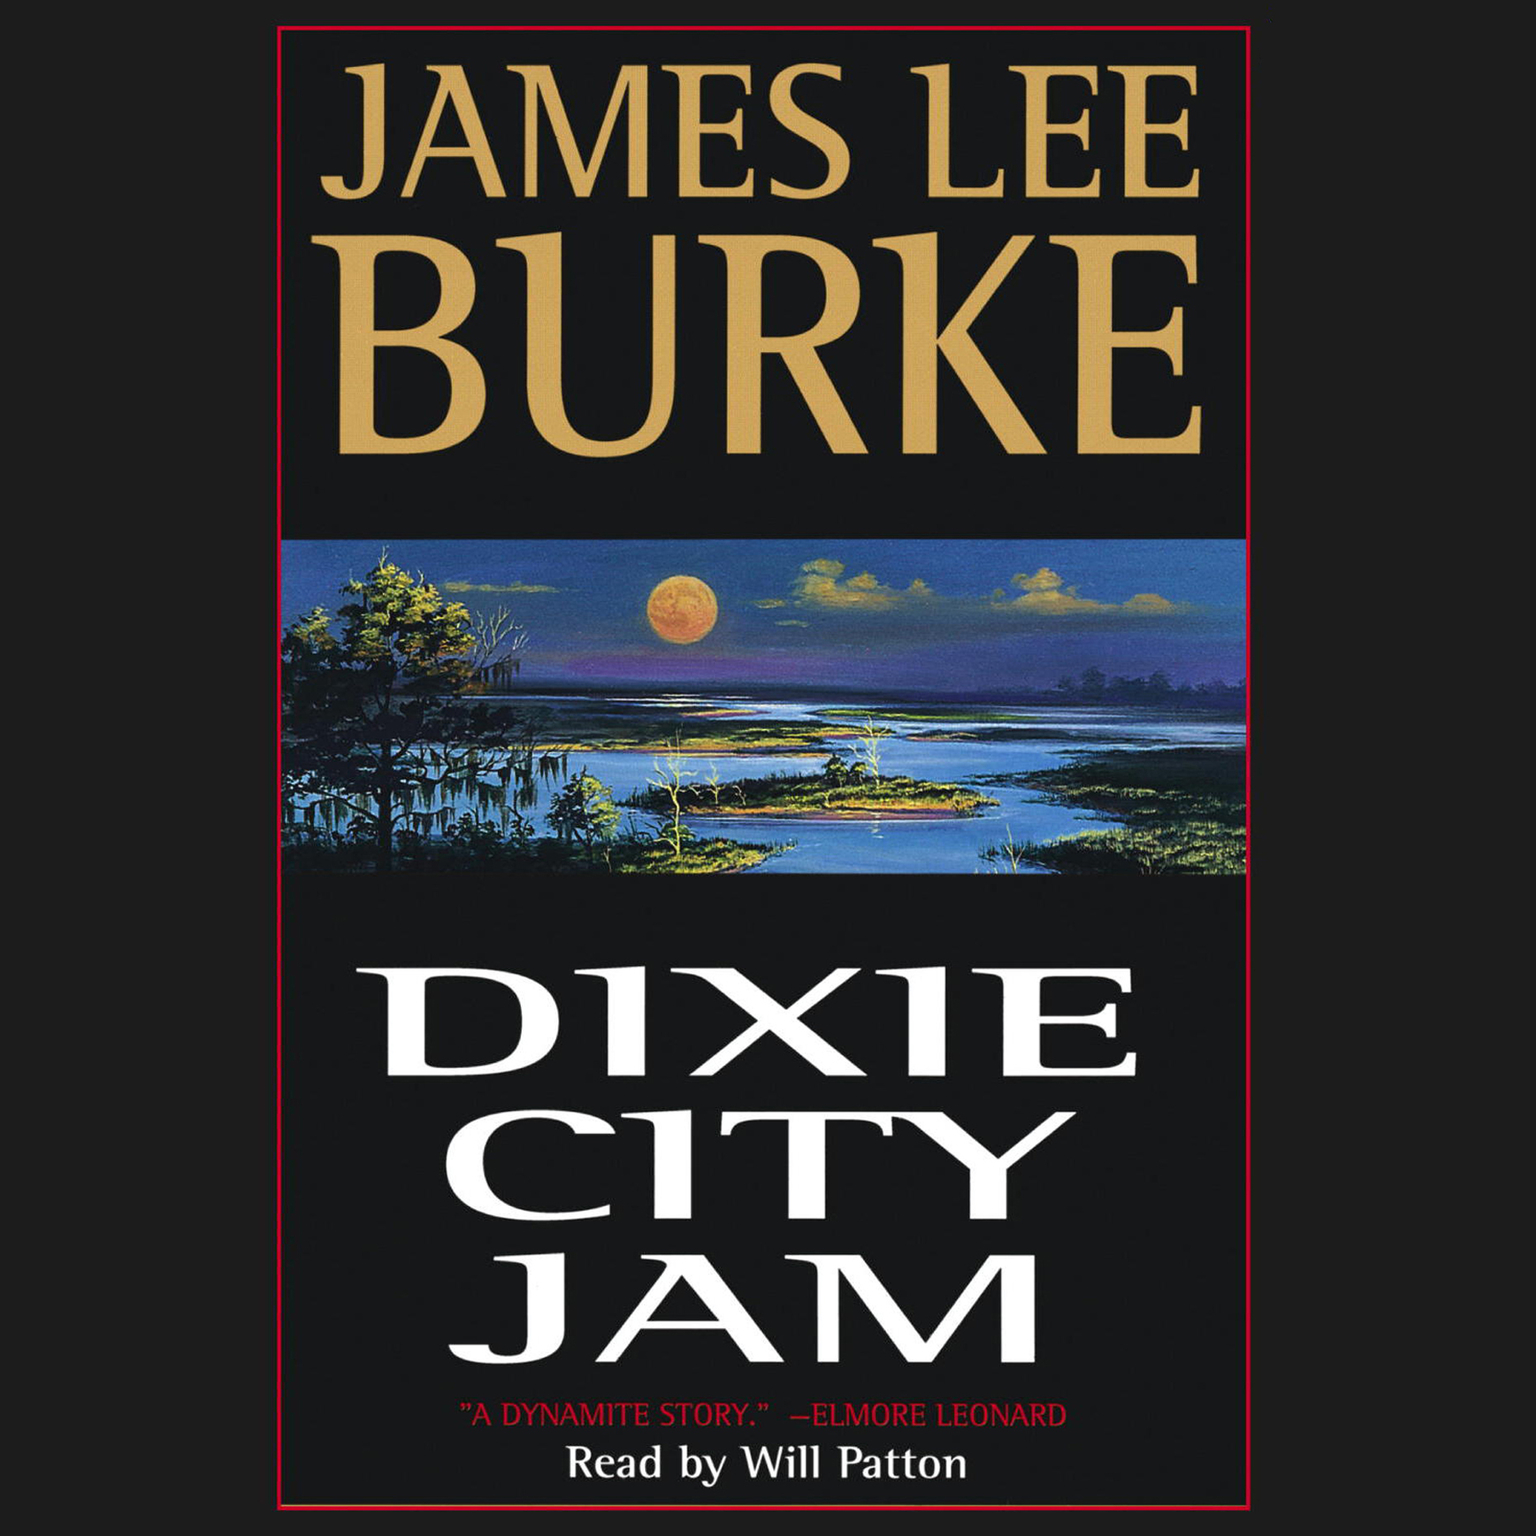 Dixie City Jam (Abridged) Audiobook, by James Lee Burke